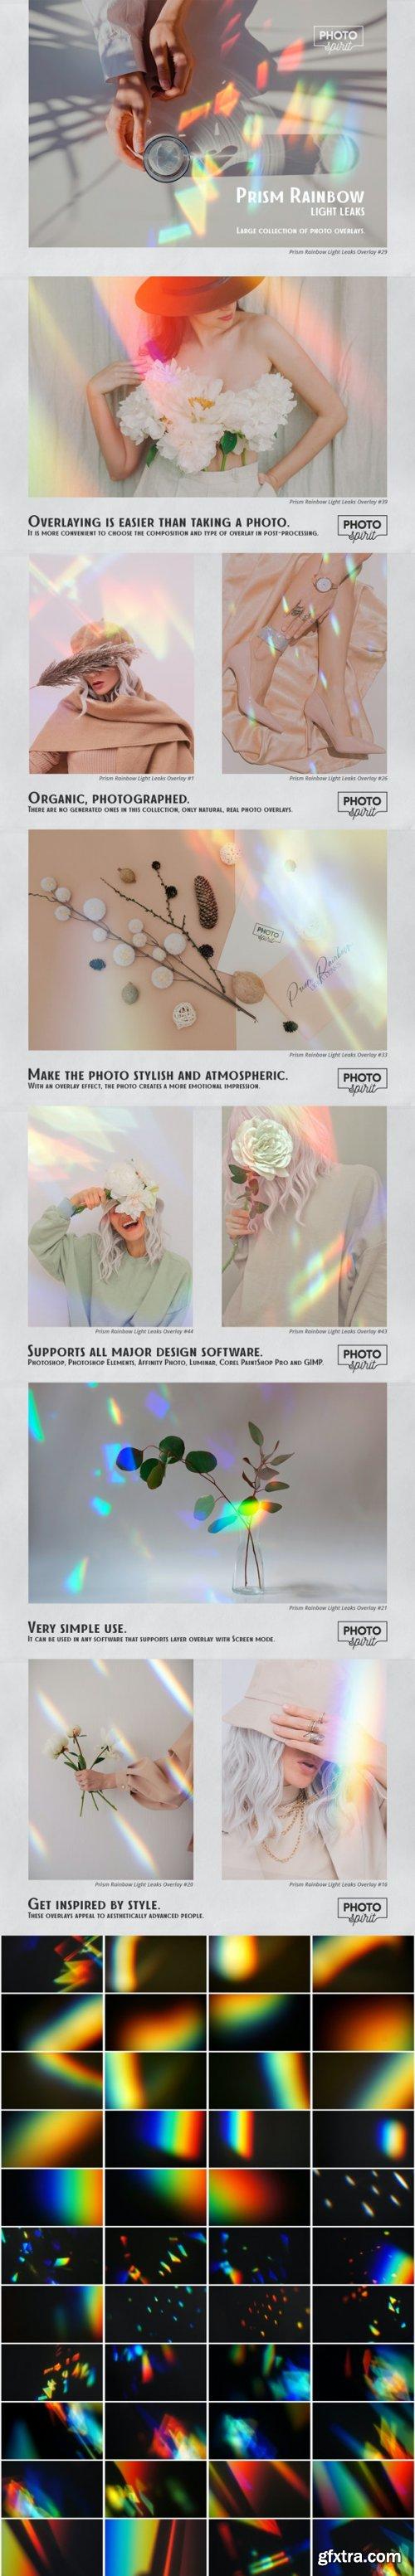 GraphicRiver - Prism Rainbow Light Leaks Overlays 32687434